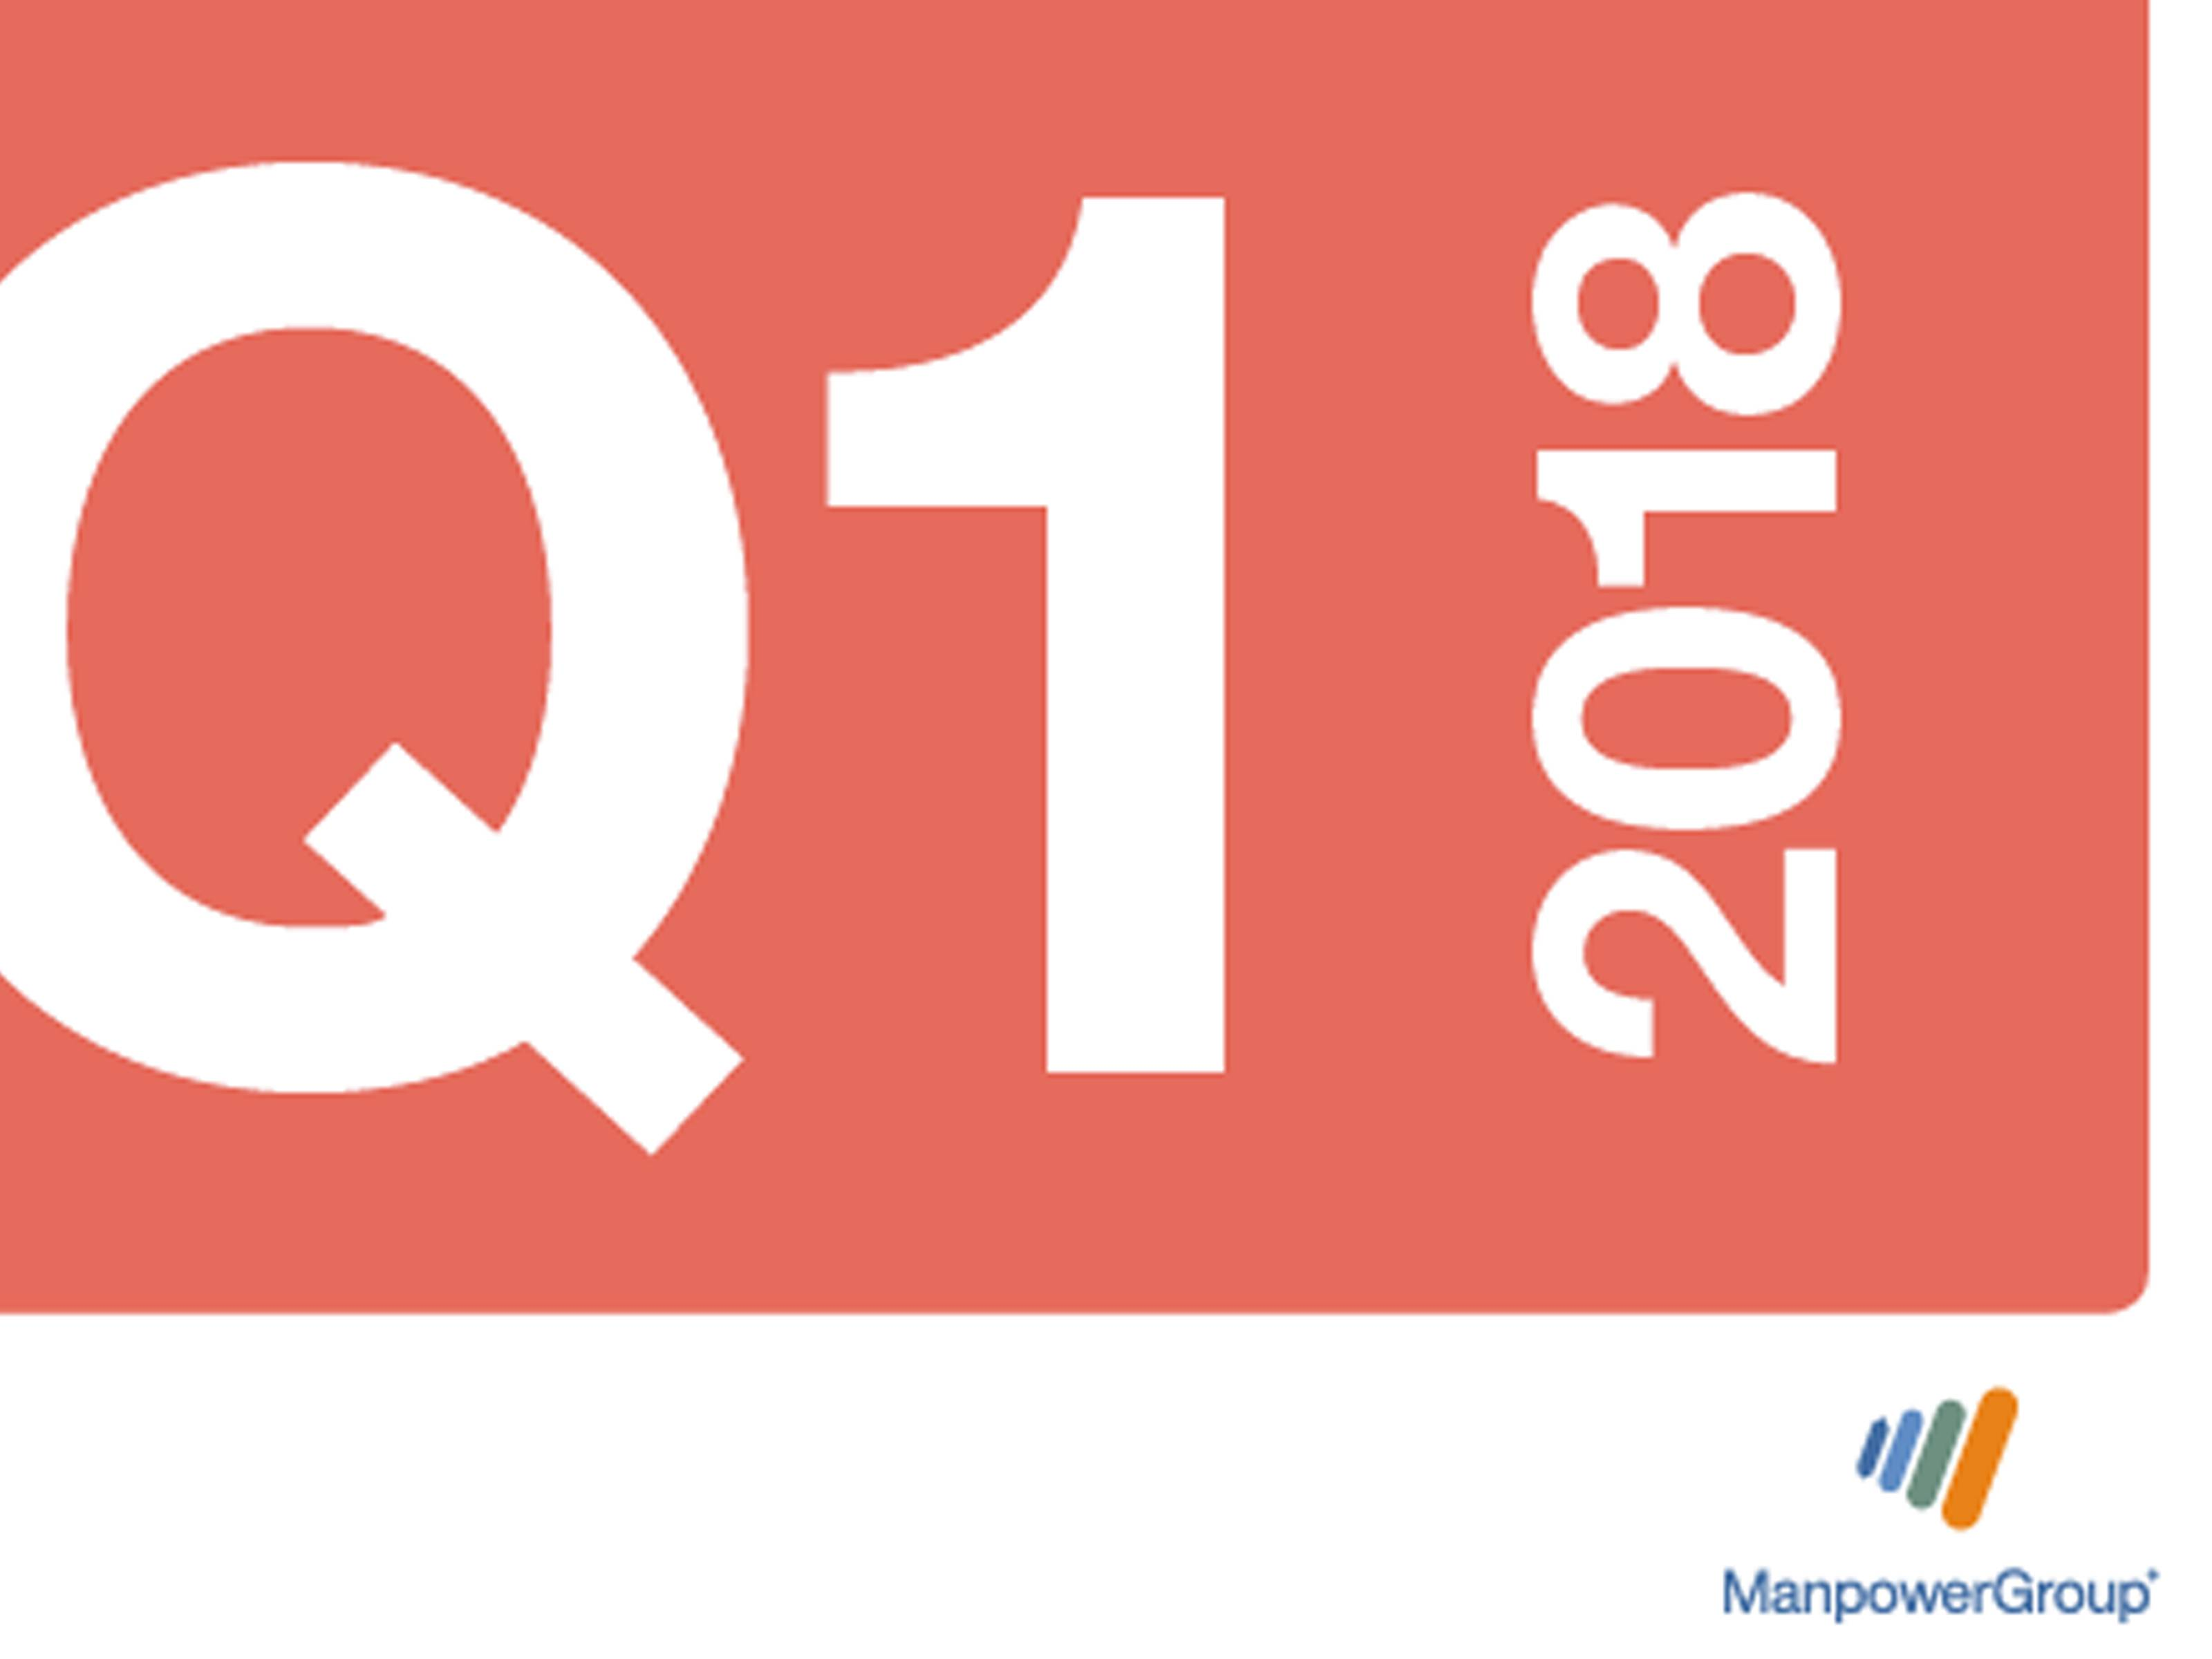 Q118 ManpowerGroup Employment Outlook Survey